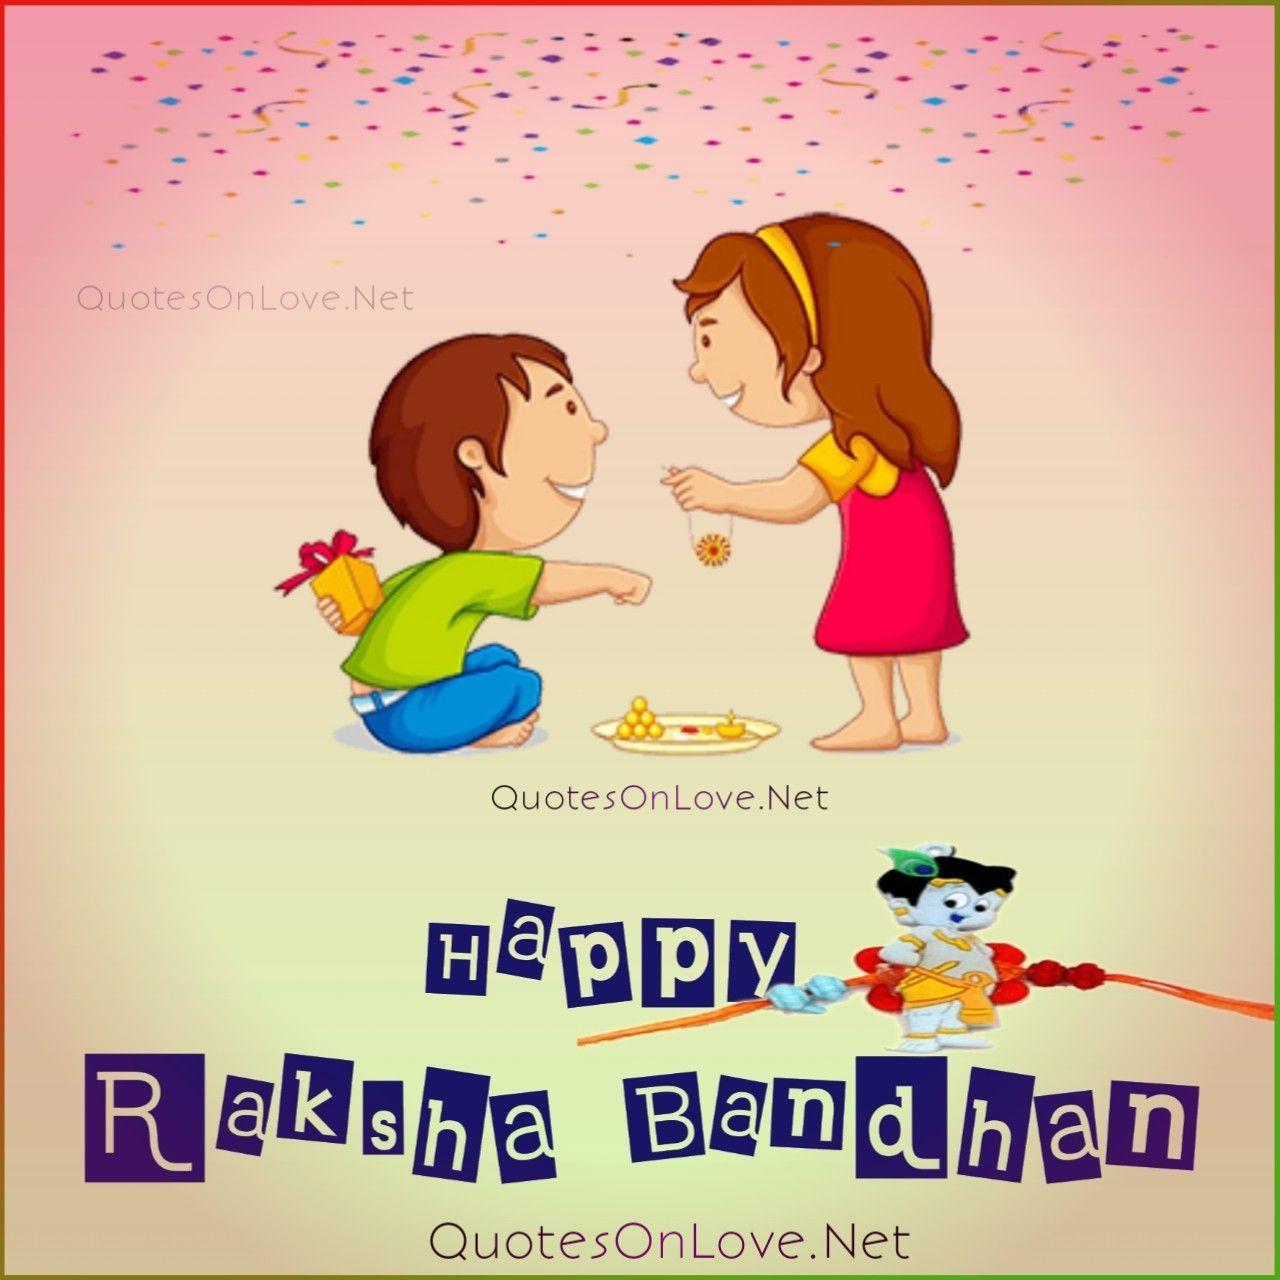 Raksha Bandhan, Raksha Bandhan Quotes , Raksha Bandhan Photography , Raksha Bandhan Cards ,Rakhi ,Rakhi Design , Rakhi design hand made, Rakhi Images , Raksha Bandhan Images #rakshabandhancards Raksha Bandhan, Raksha Bandhan Quotes , Raksha Bandhan Photography , Raksha Bandhan Cards ,Rakhi ,Rakhi Design , Rakhi design hand made, Rakhi Images , Raksha Bandhan Images #rakshabandhancards